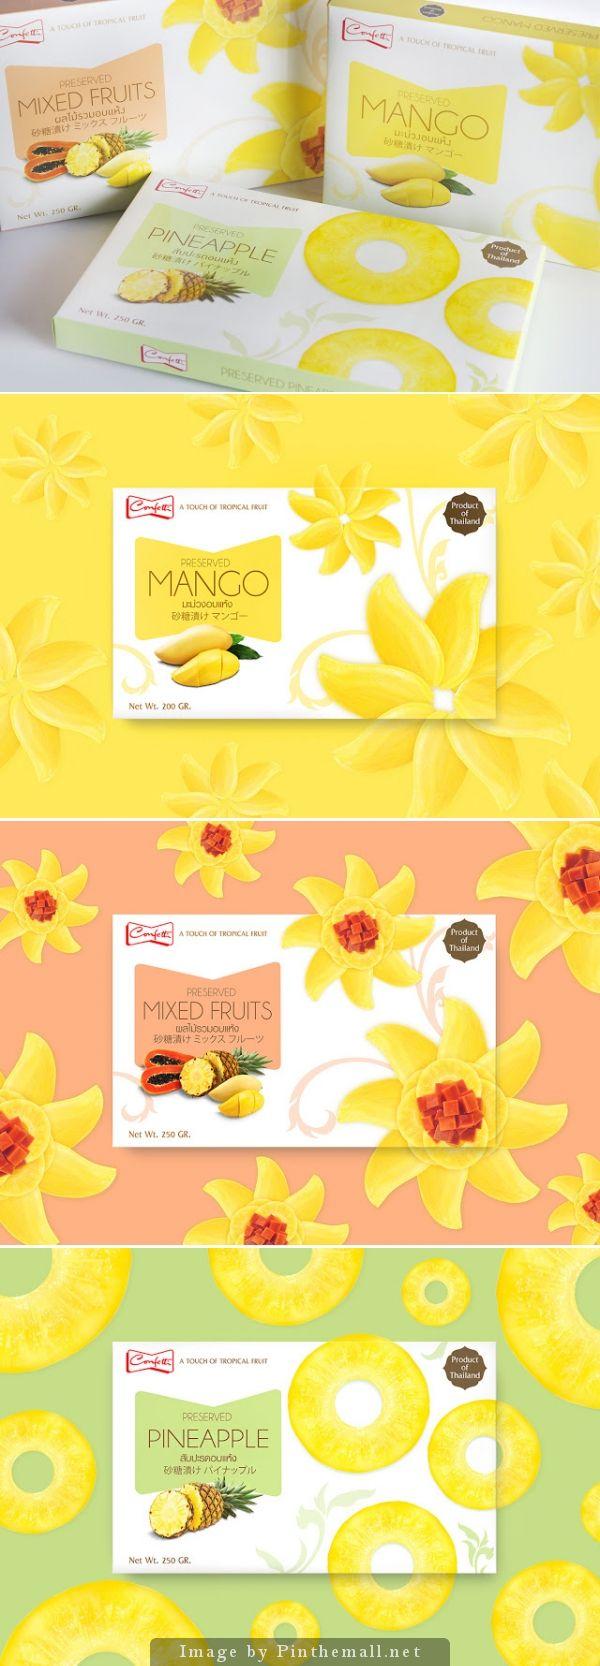 Confetti Dried Fruit Creative Agency: Prompt Design Executive Creative Director…